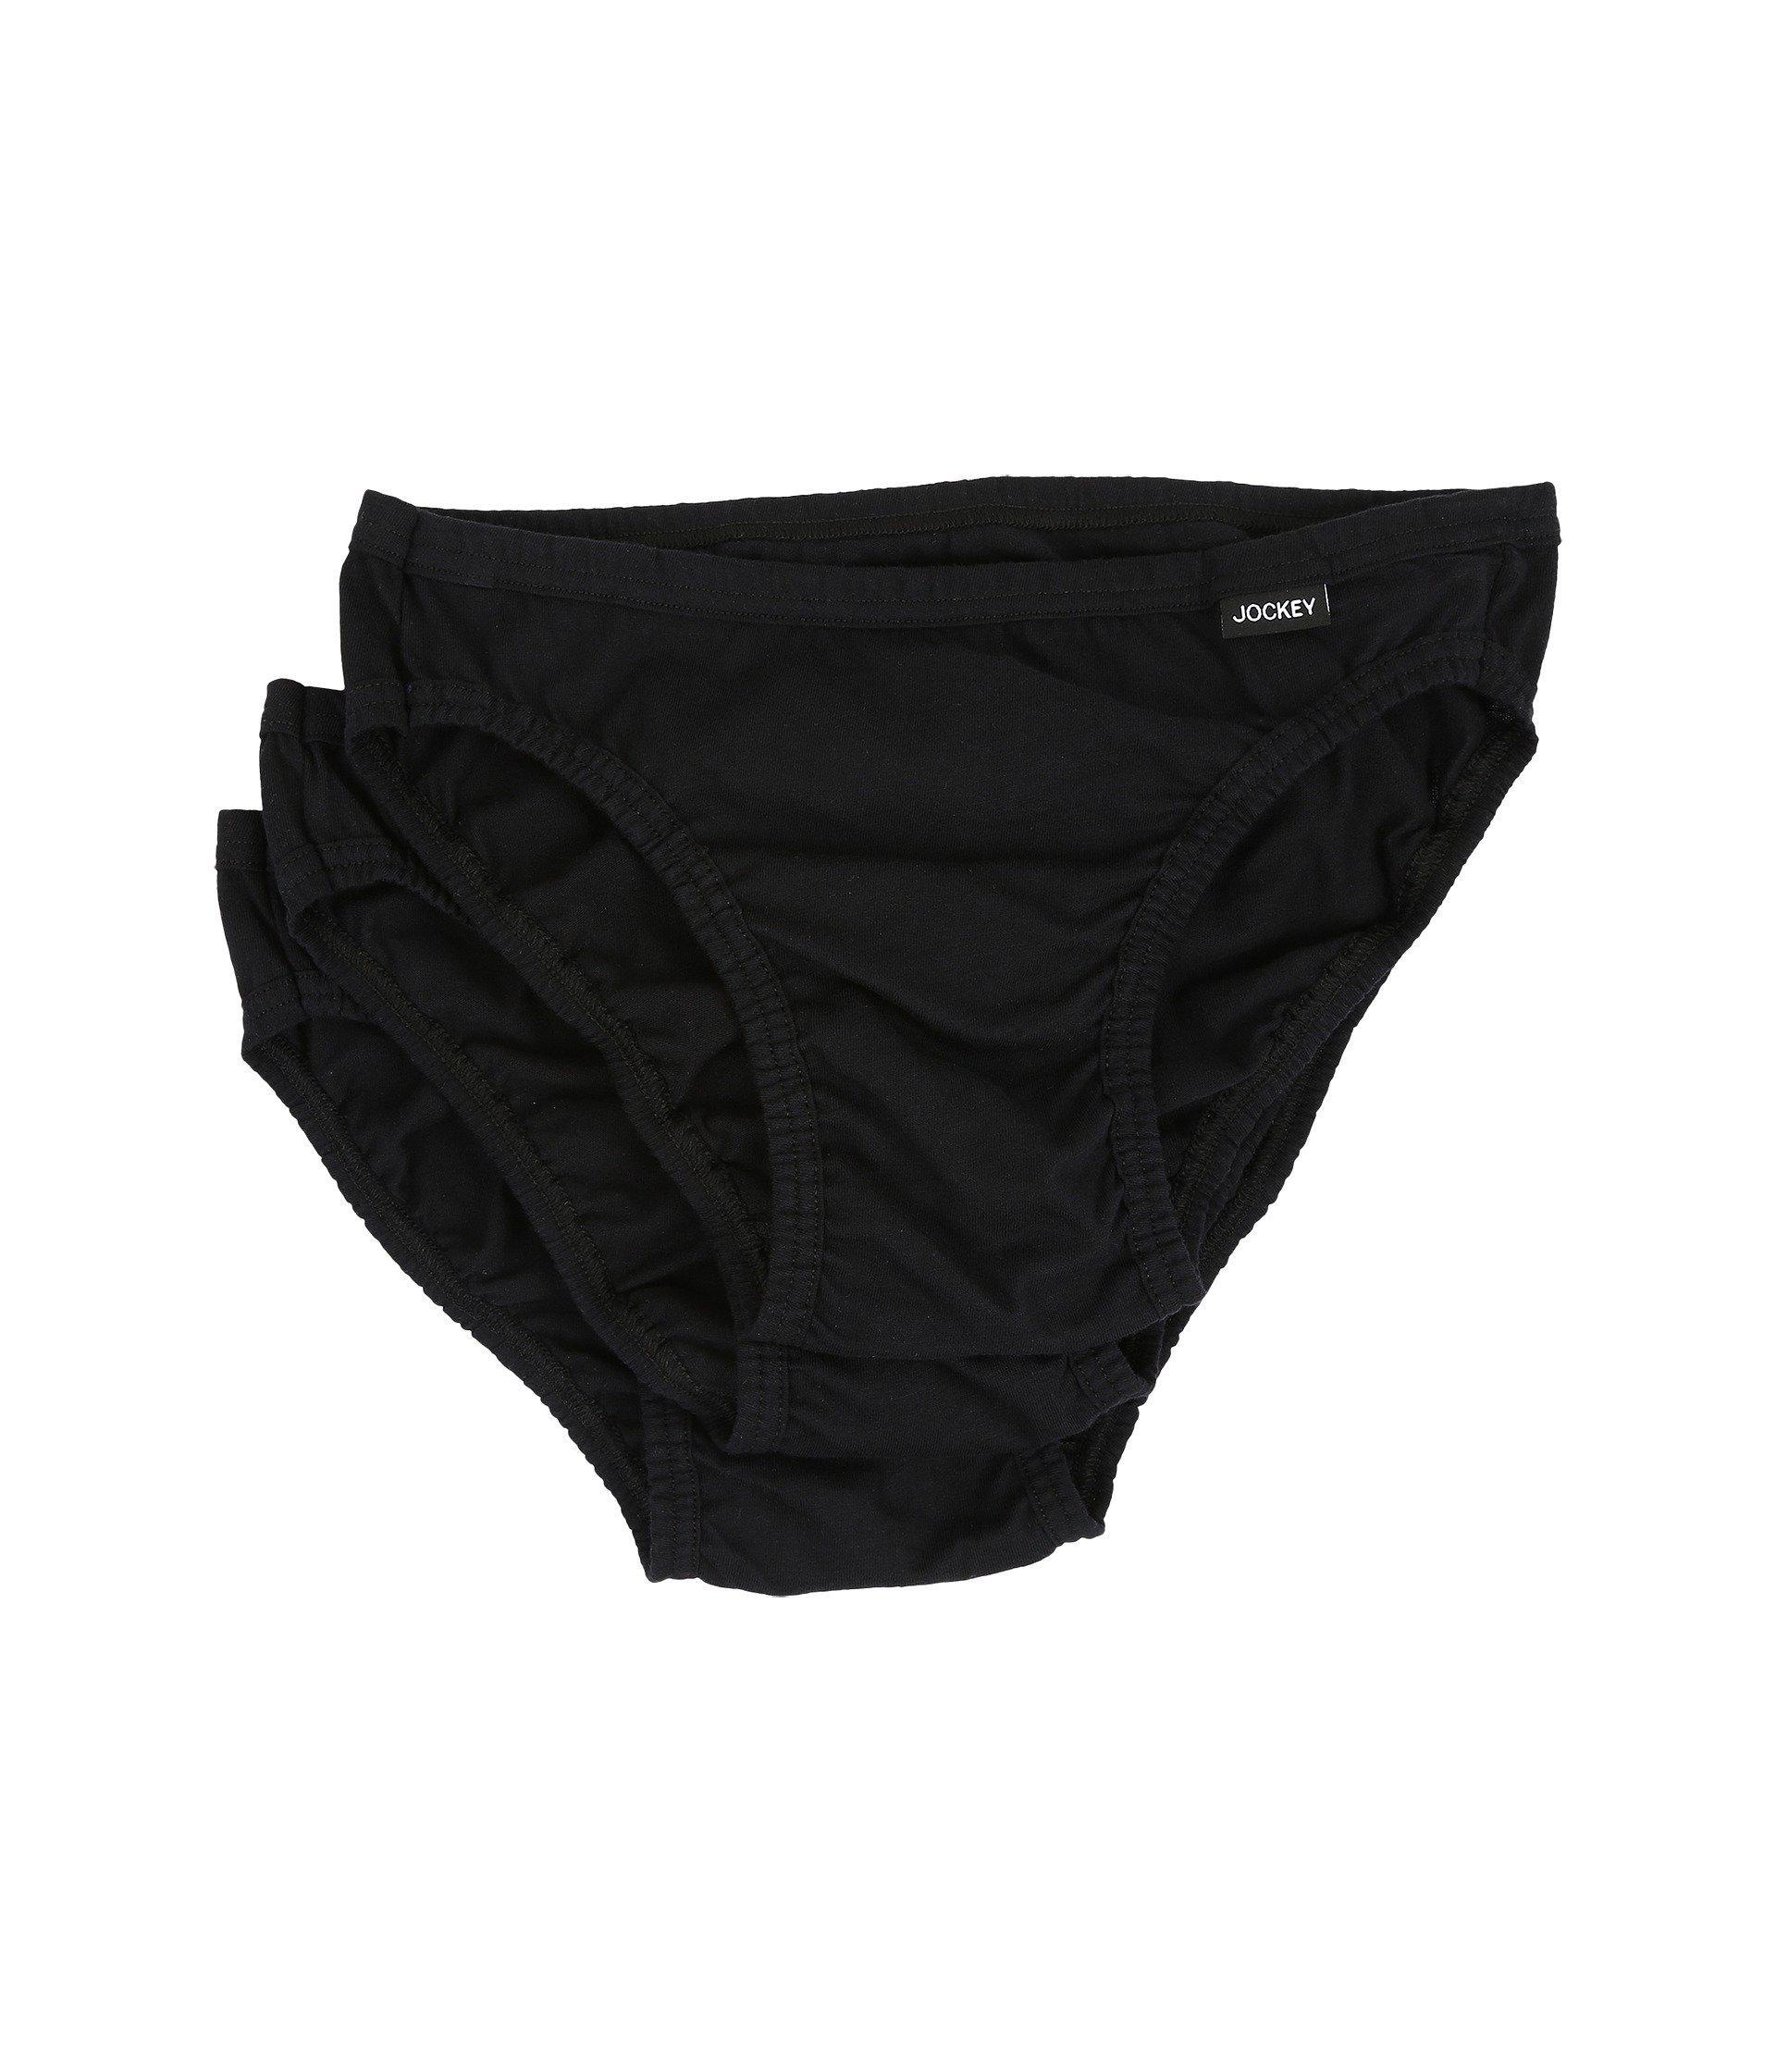 2e93b6d403e9 Lyst - Jockey Elance(r) Bikini - 3 Pack (black) Men's Underwear in ...